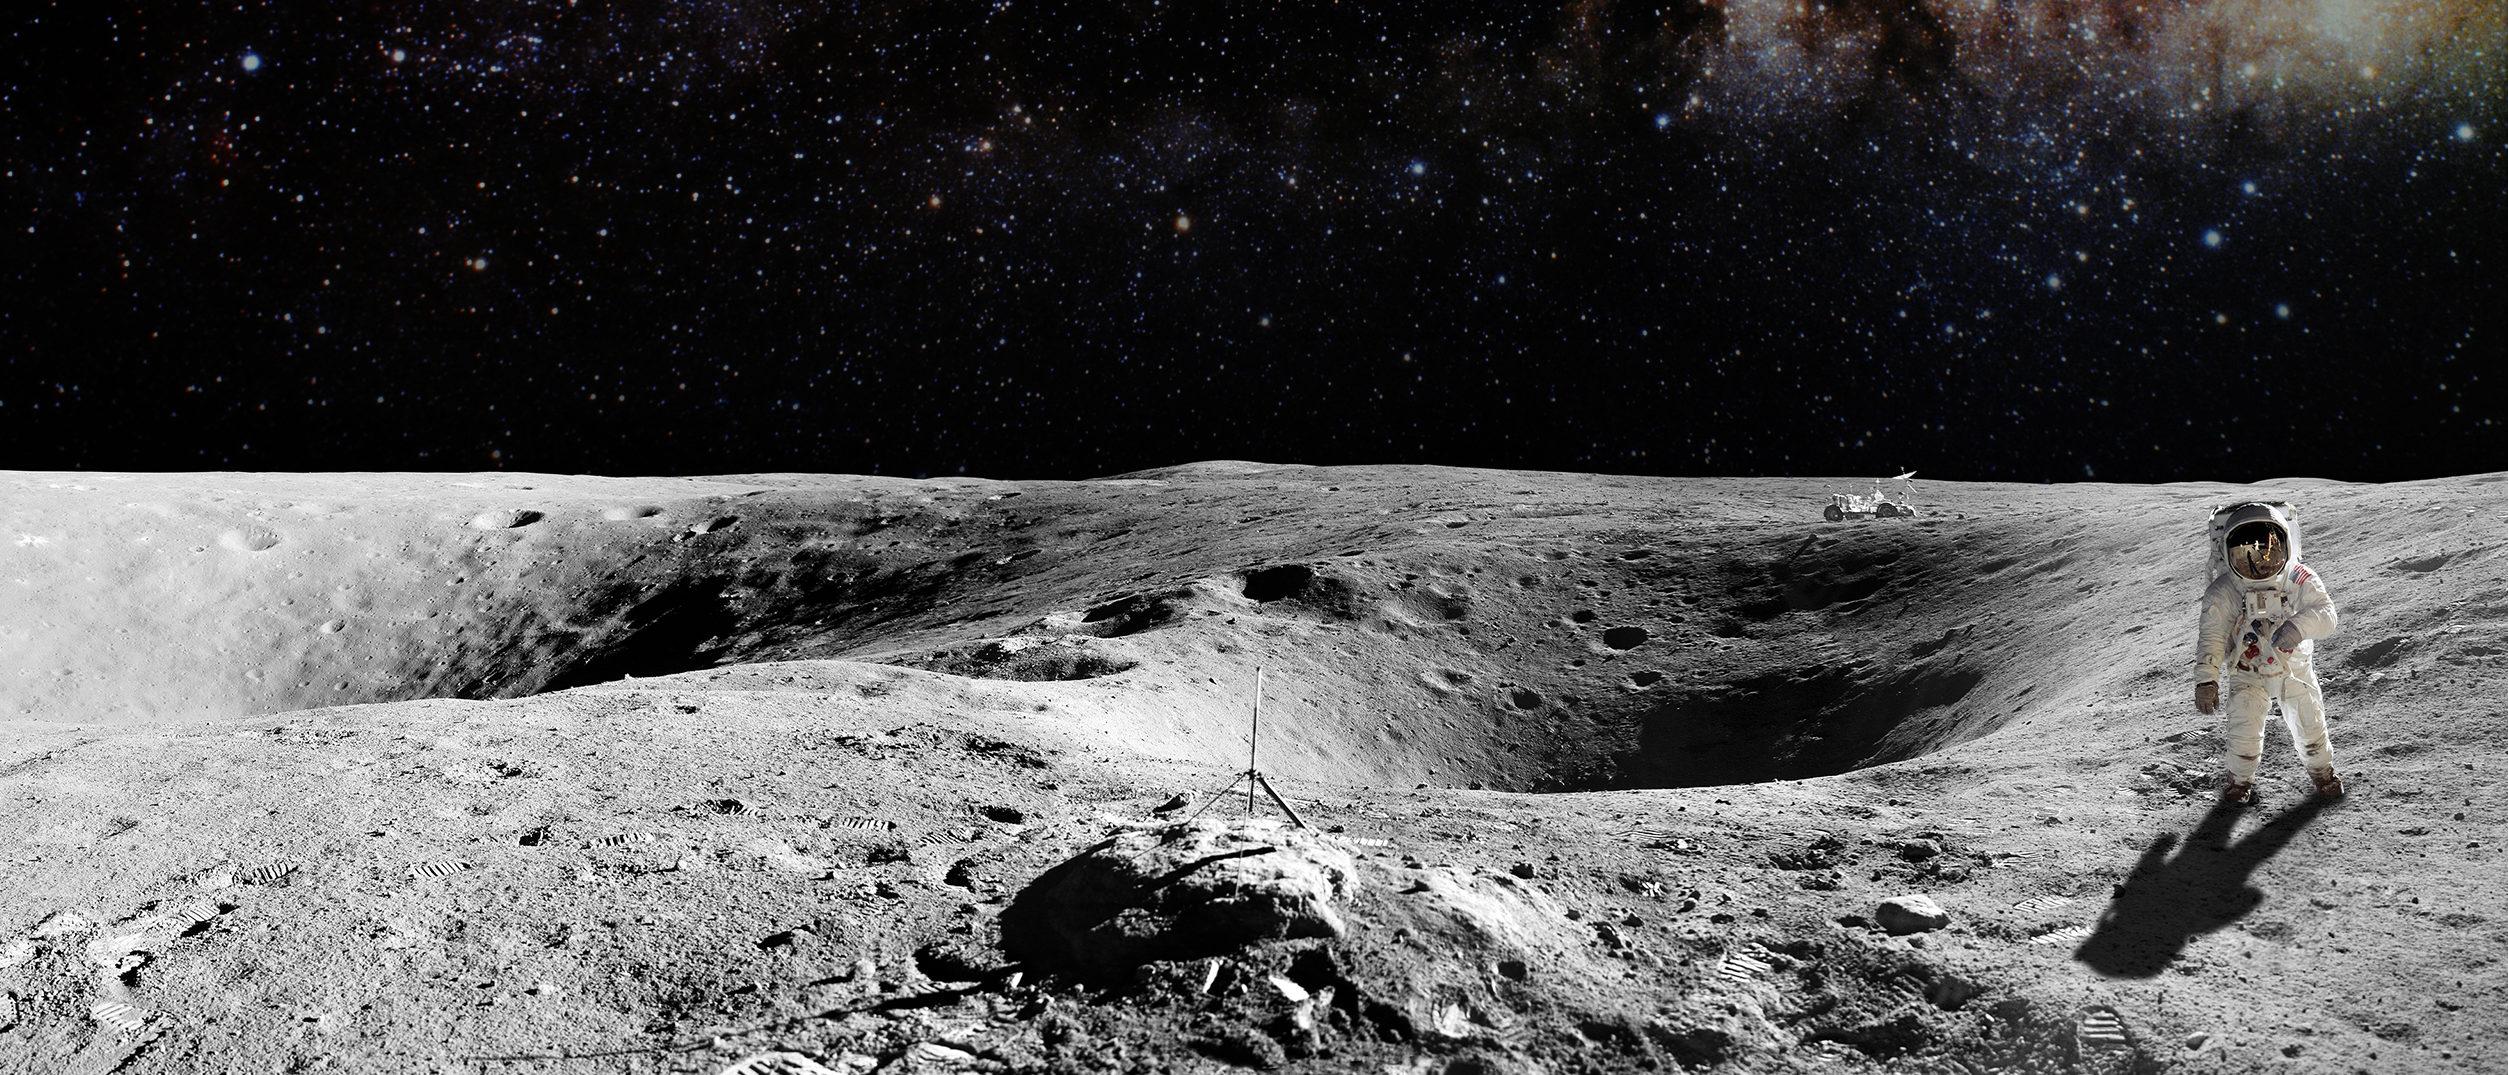 Picture of man walking on the moon (Shutterstock/Castleski)